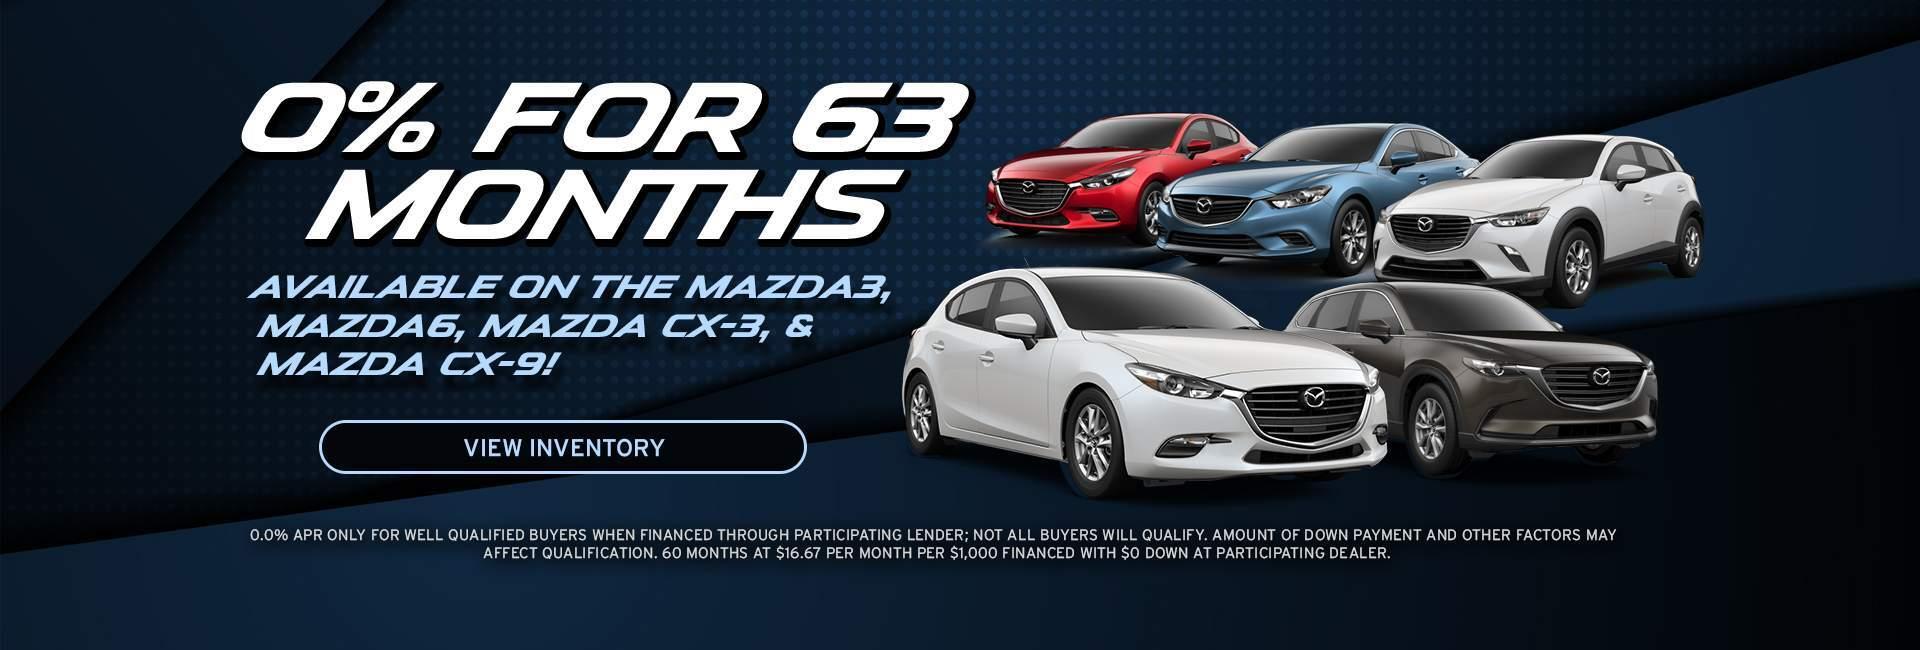 Jeff Schmitt Chevy >> Chevrolet, Mazda, Nissan, Dayton OH | Cadillac Mitsubishi | Jeff Schmitt Auto Group New & Used ...